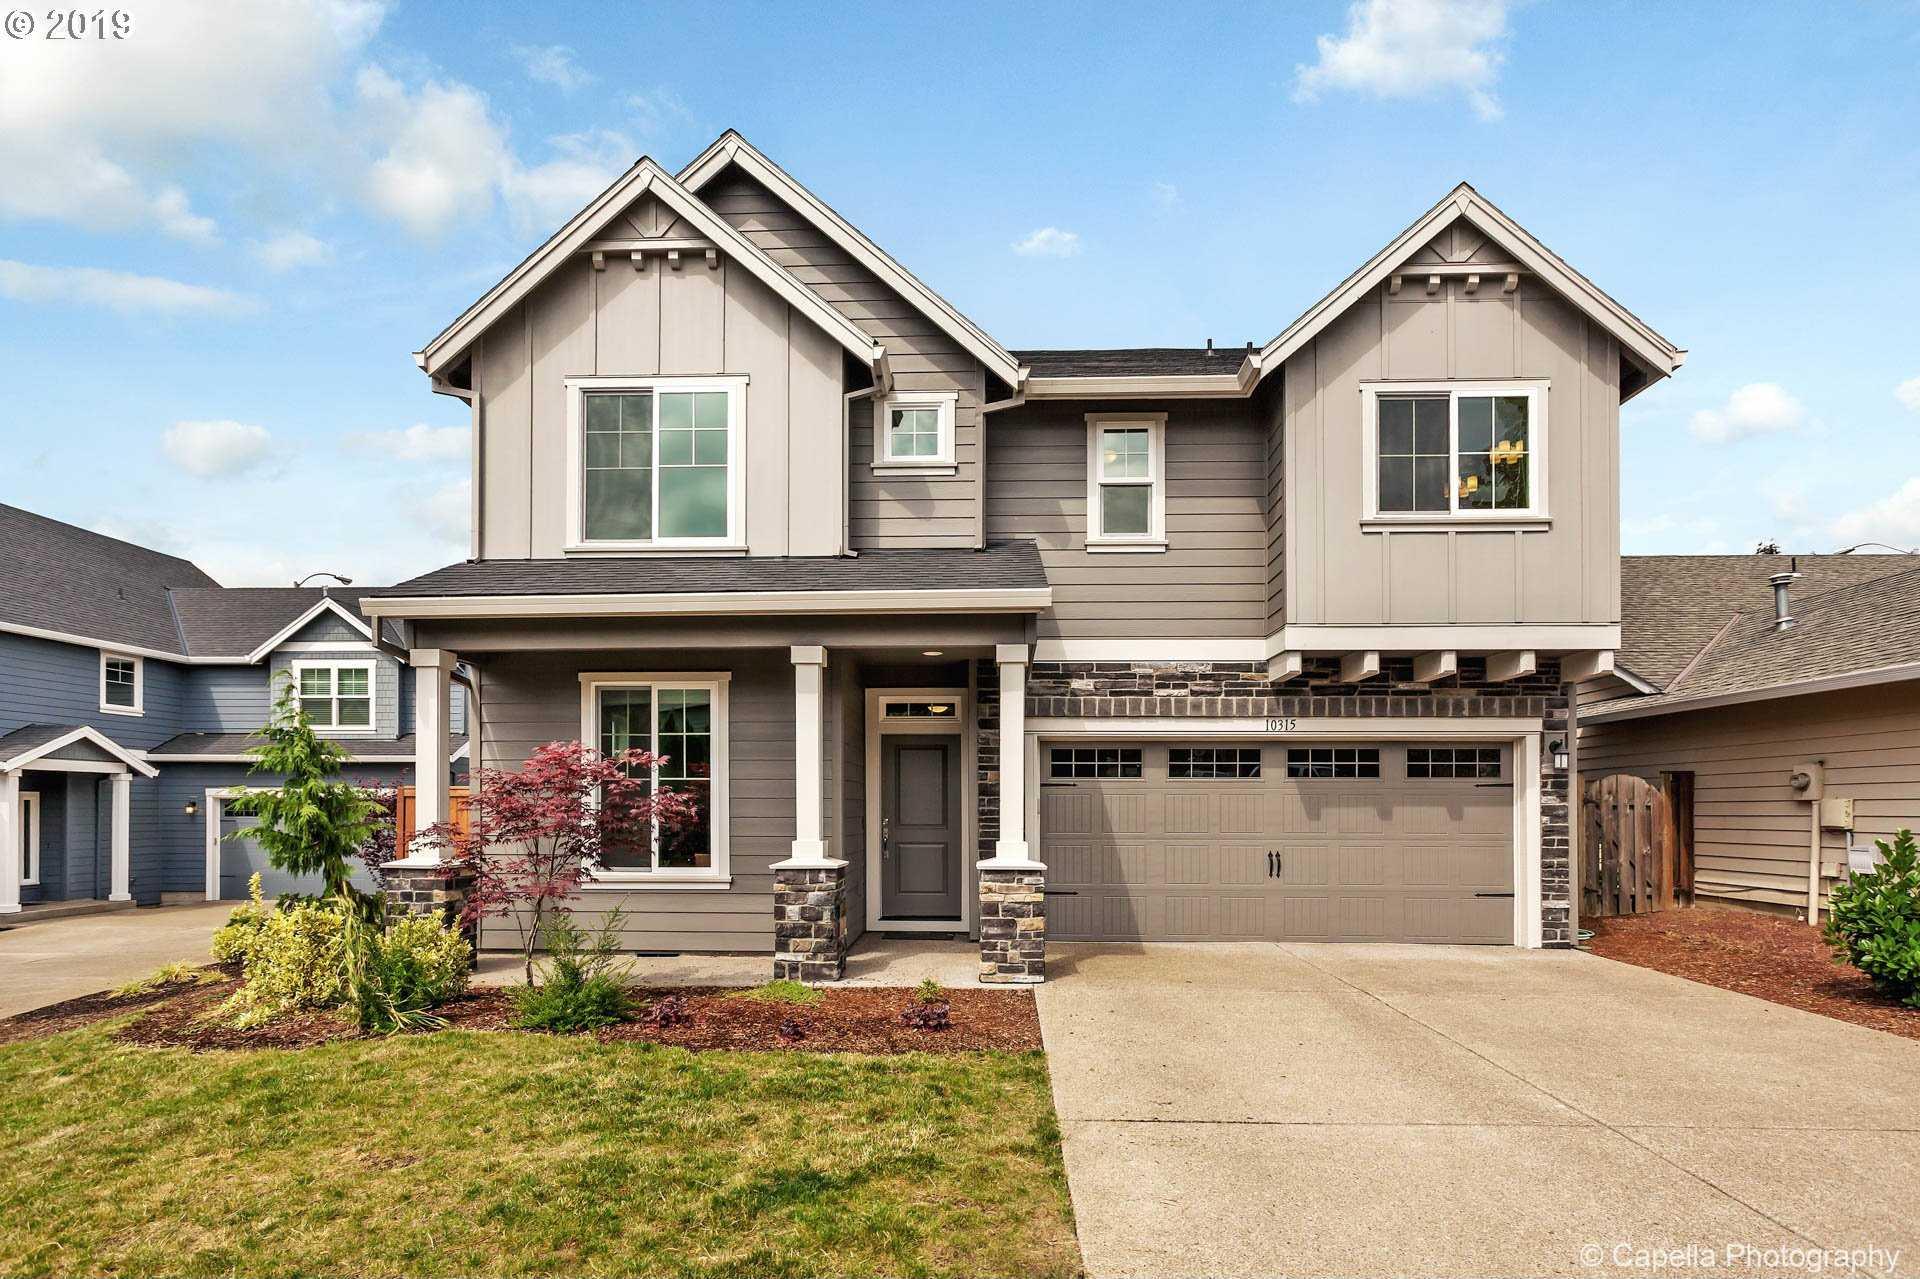 $550,000 - 4Br/3Ba -  for Sale in Beaverton